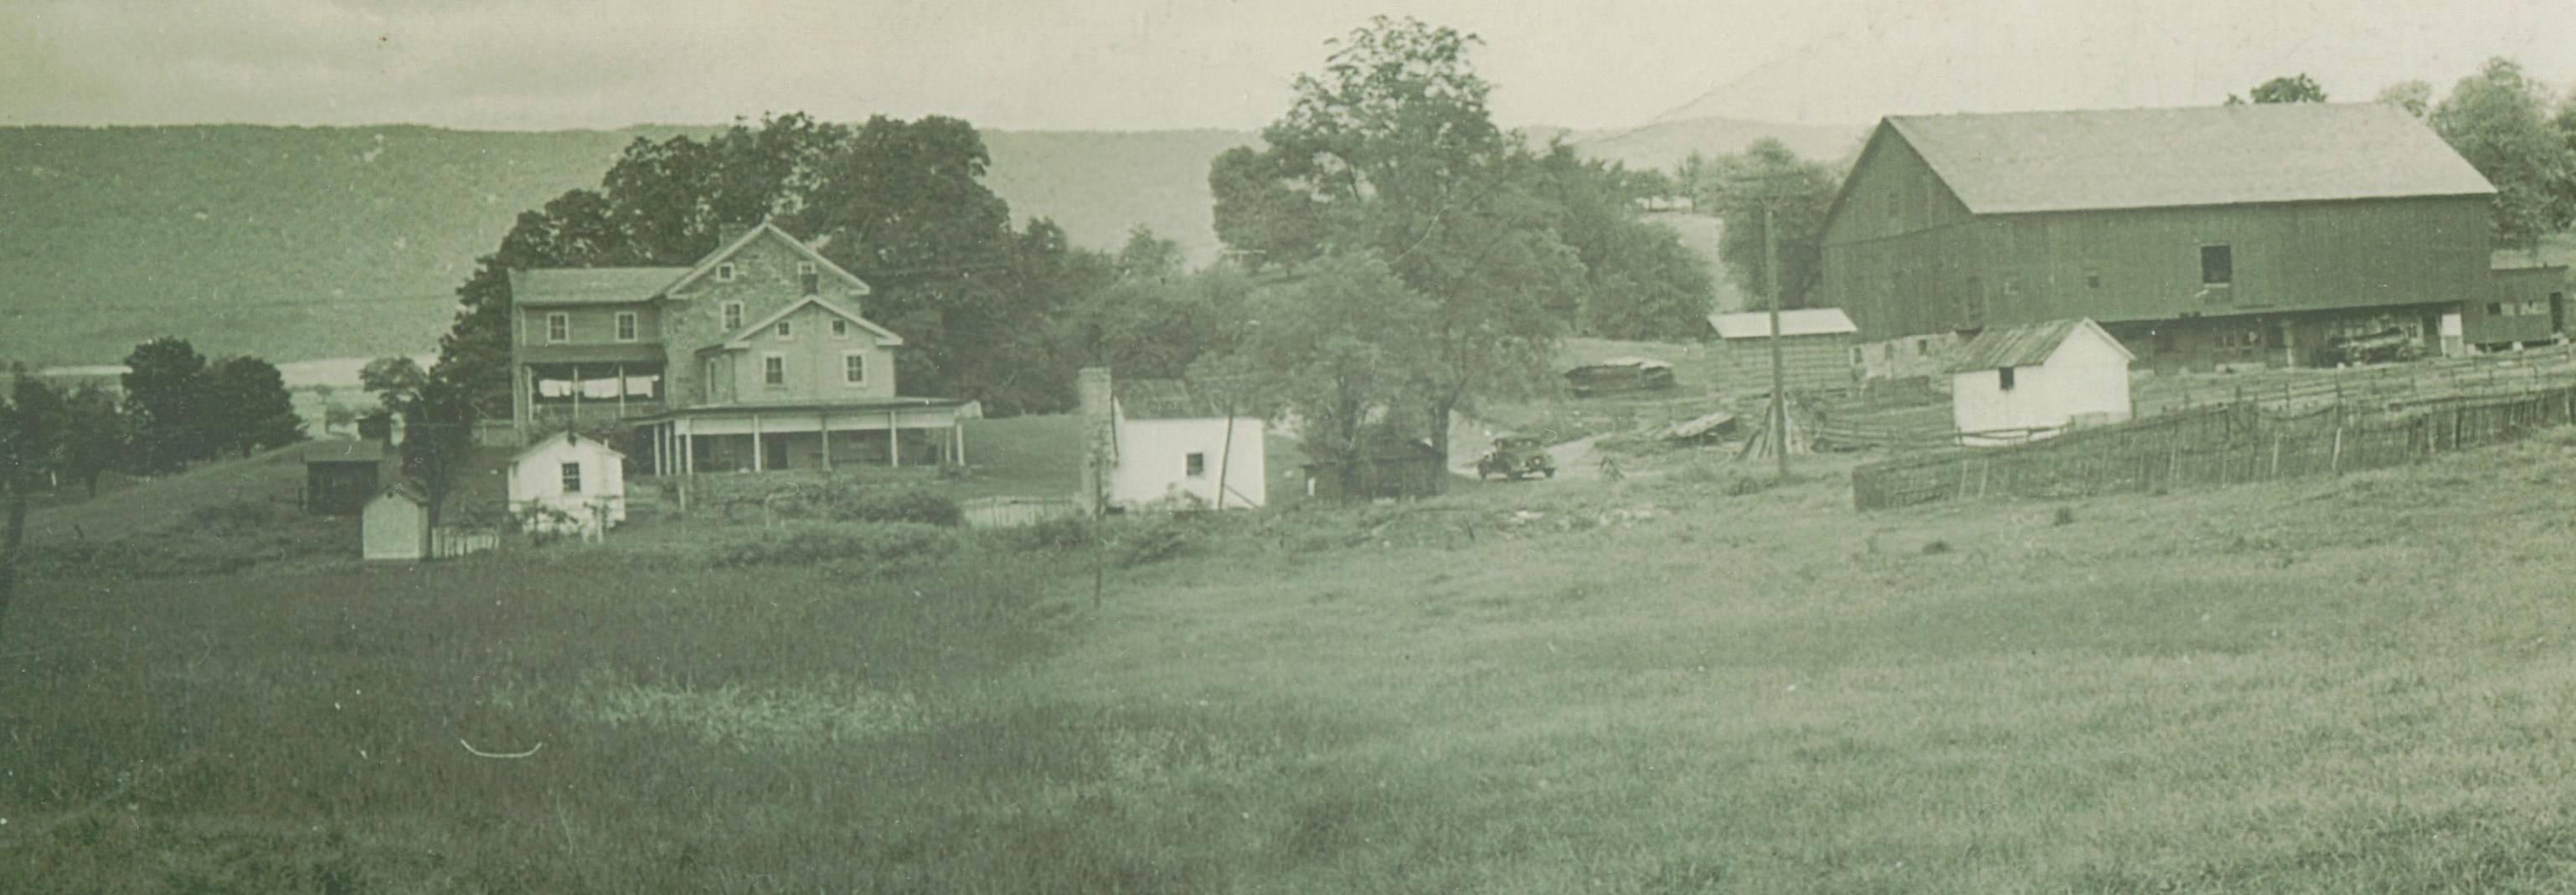 Brumbaugh Farm